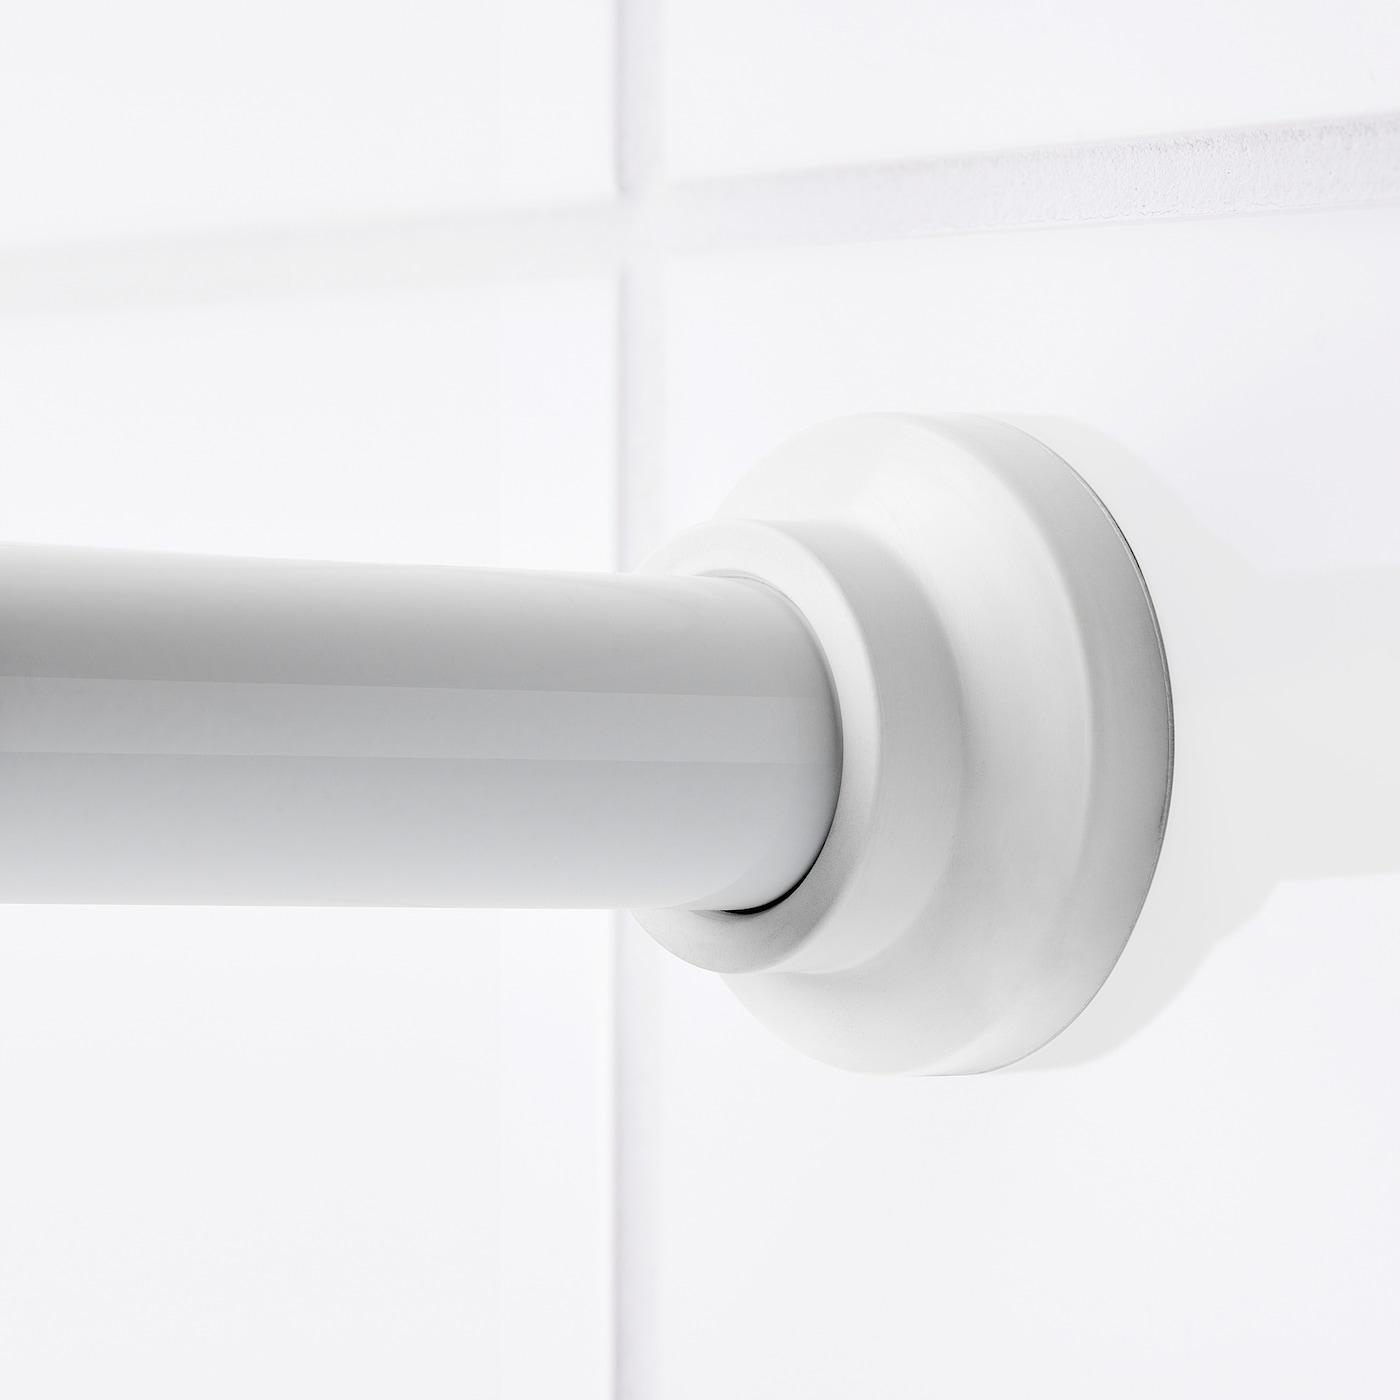 Botaren Shower Curtain Rod White 120 200 Cm Ikea